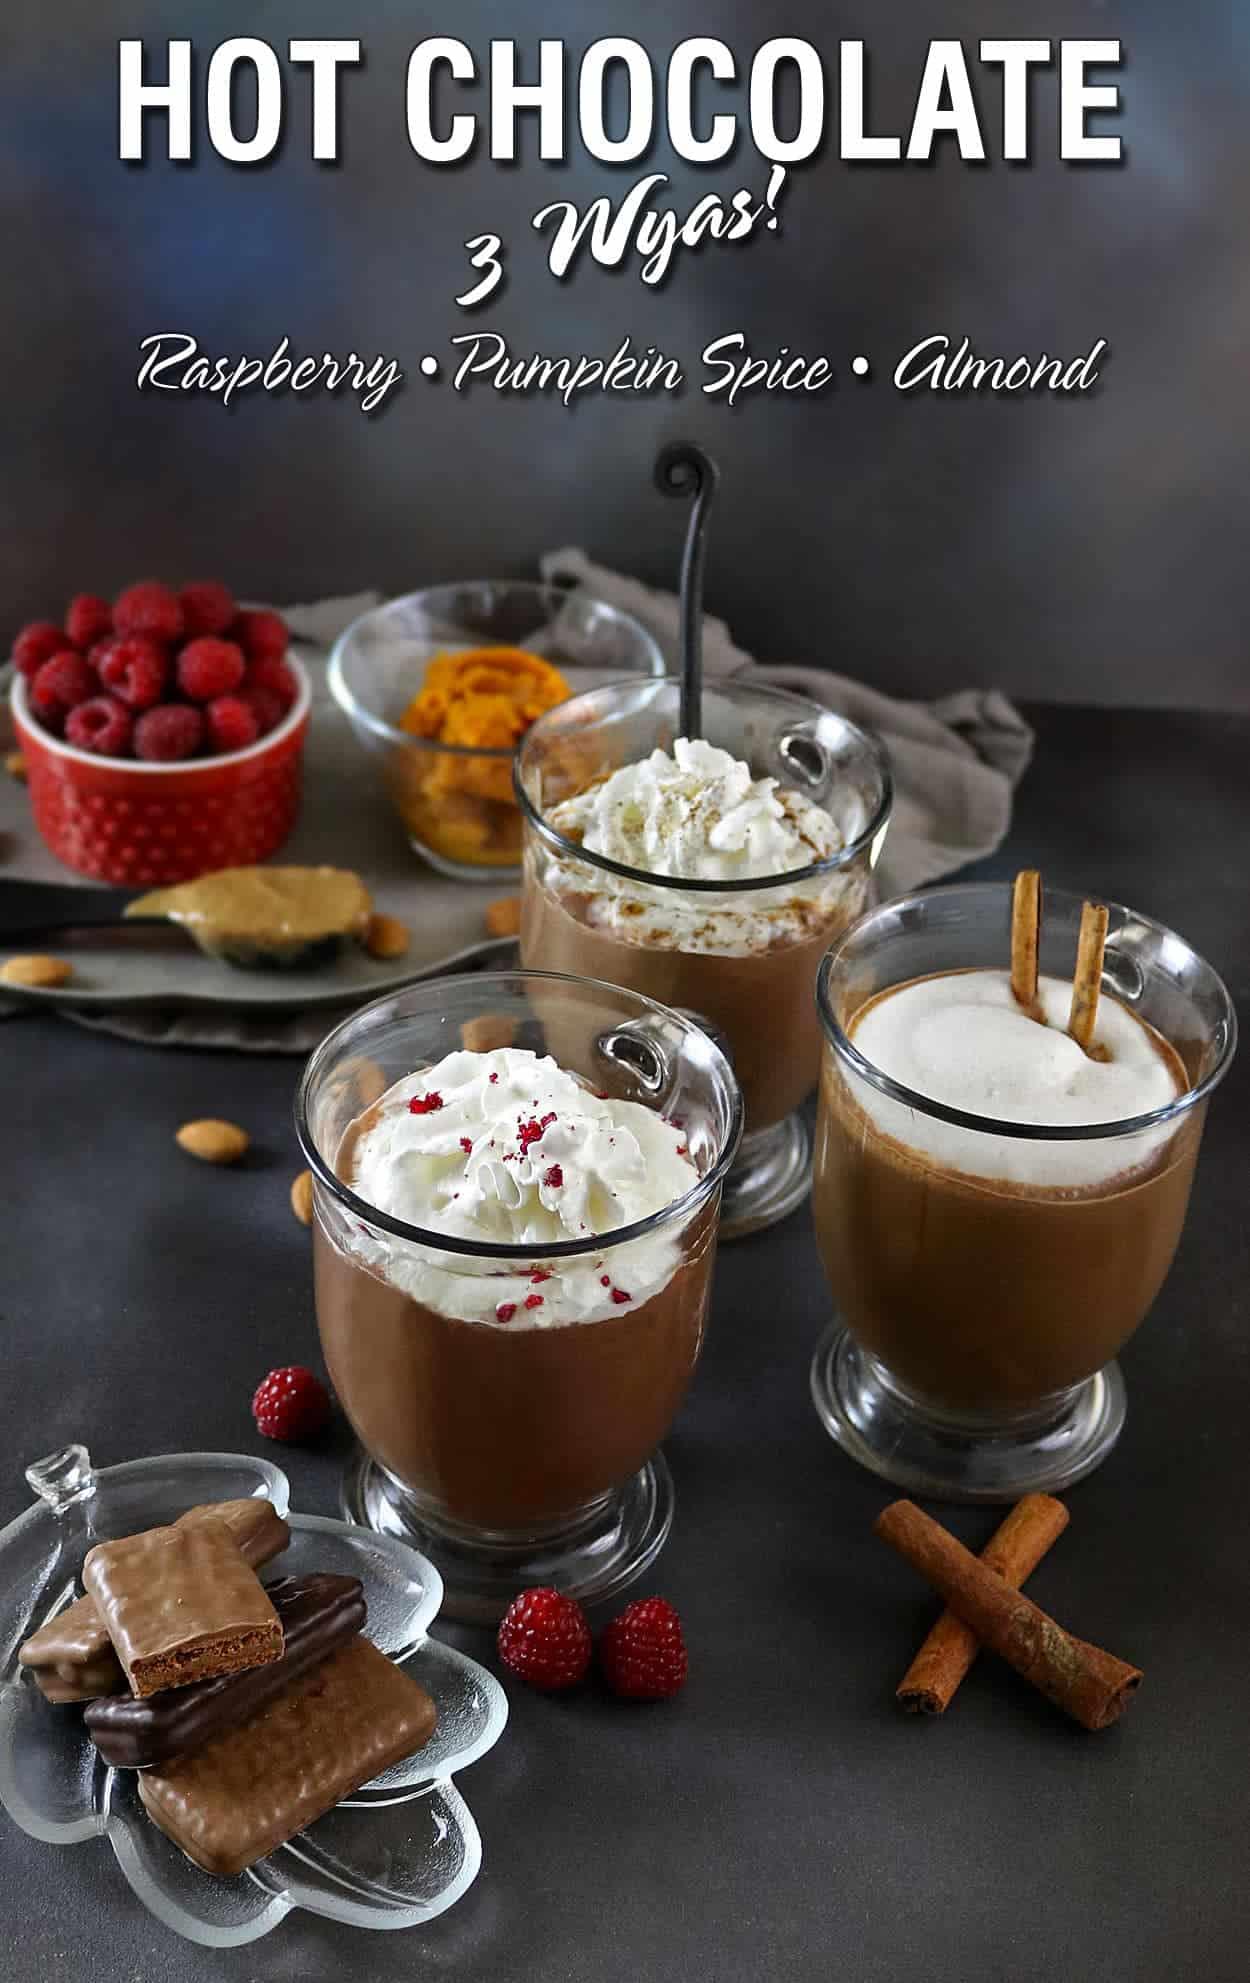 Pumpkin Spice, Almond, & Raspberry Hot Chocolates perfect with Tim ...